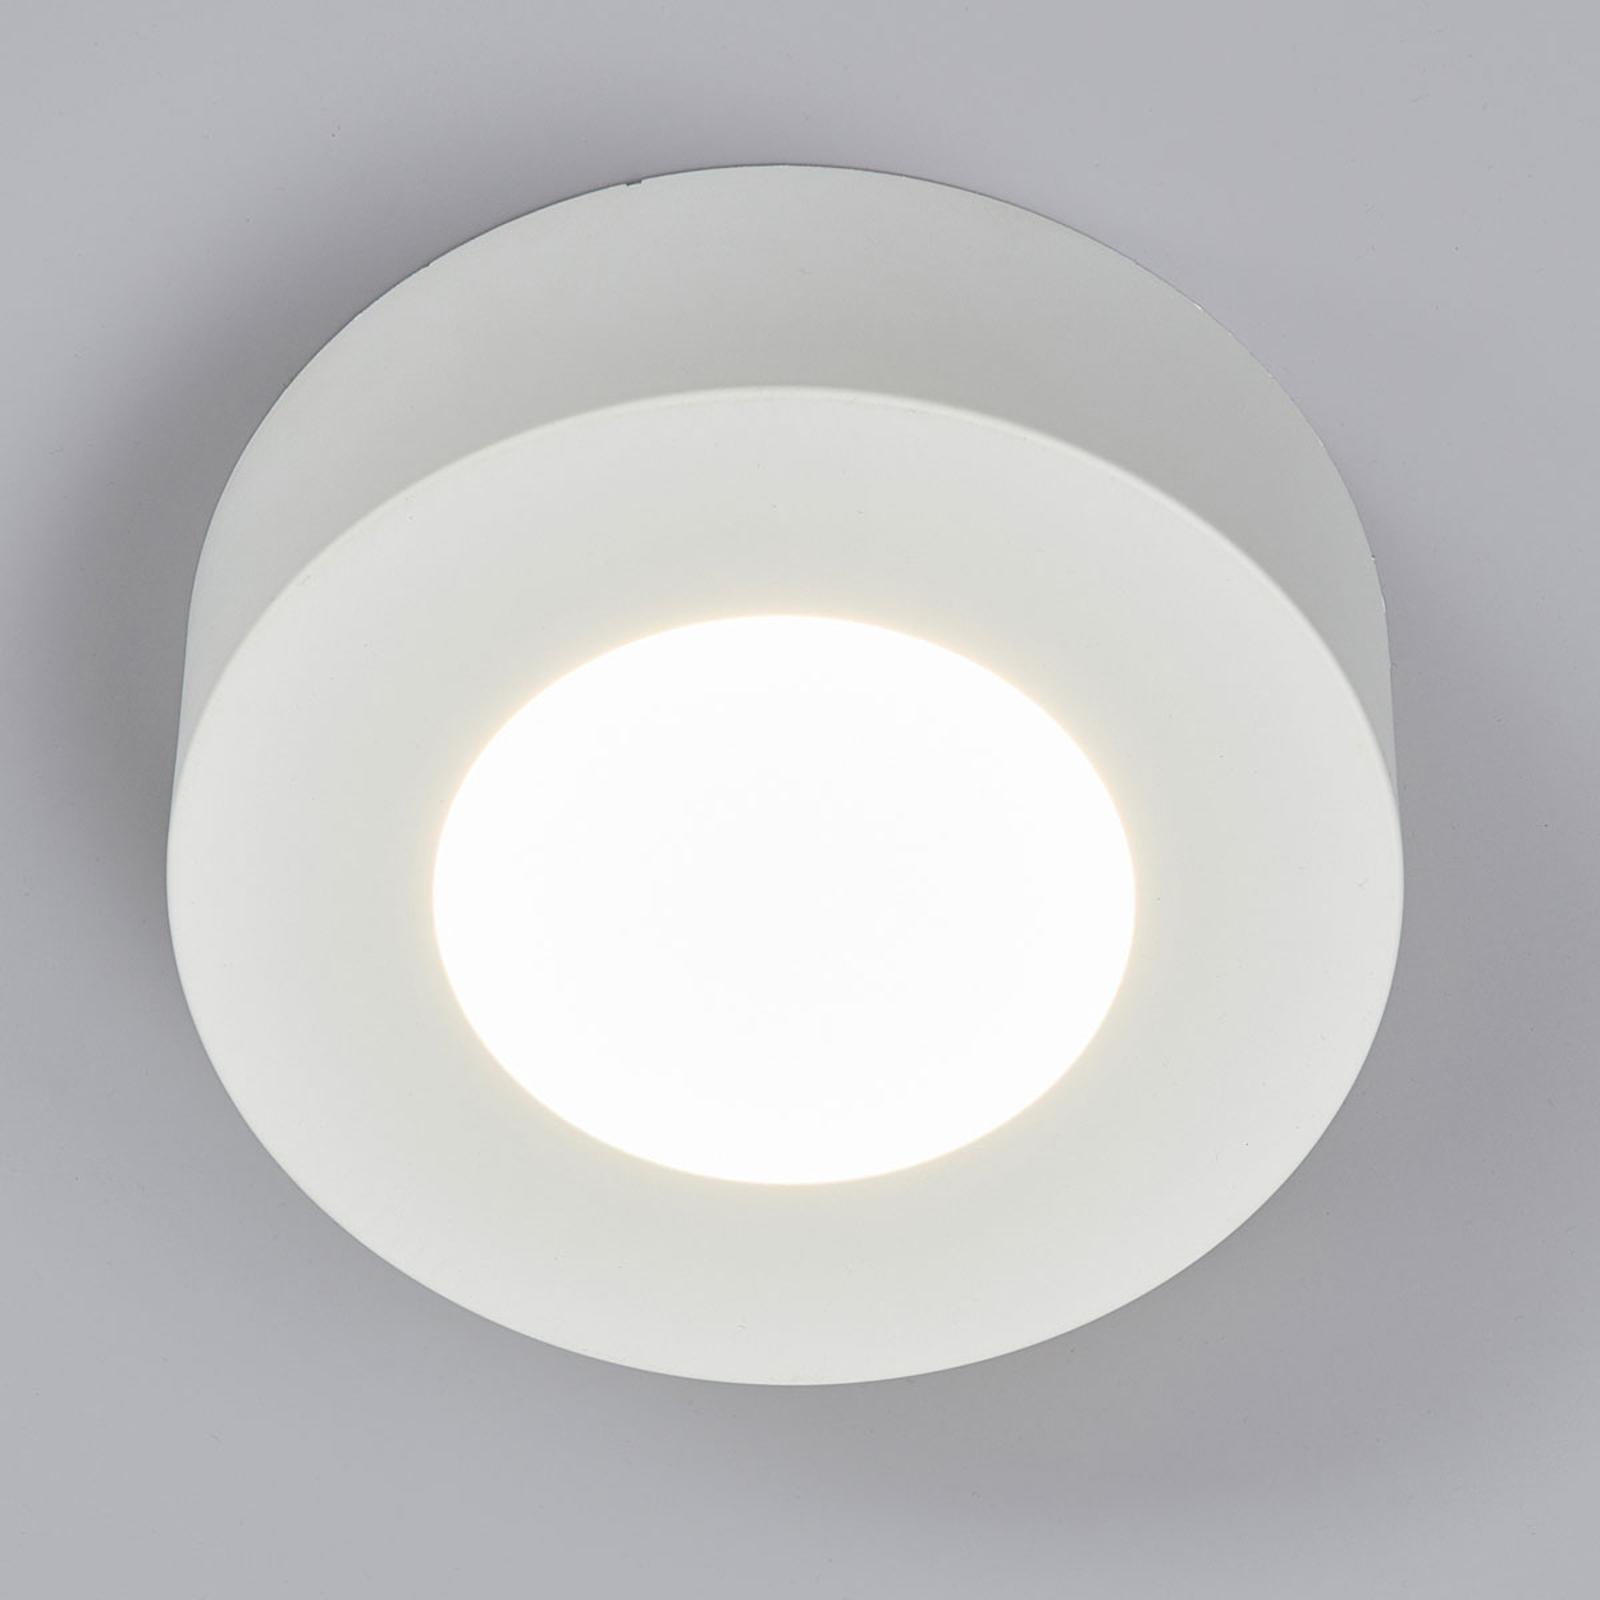 LED-loftlampe Marlo hvid 4000K rund 12,8cm